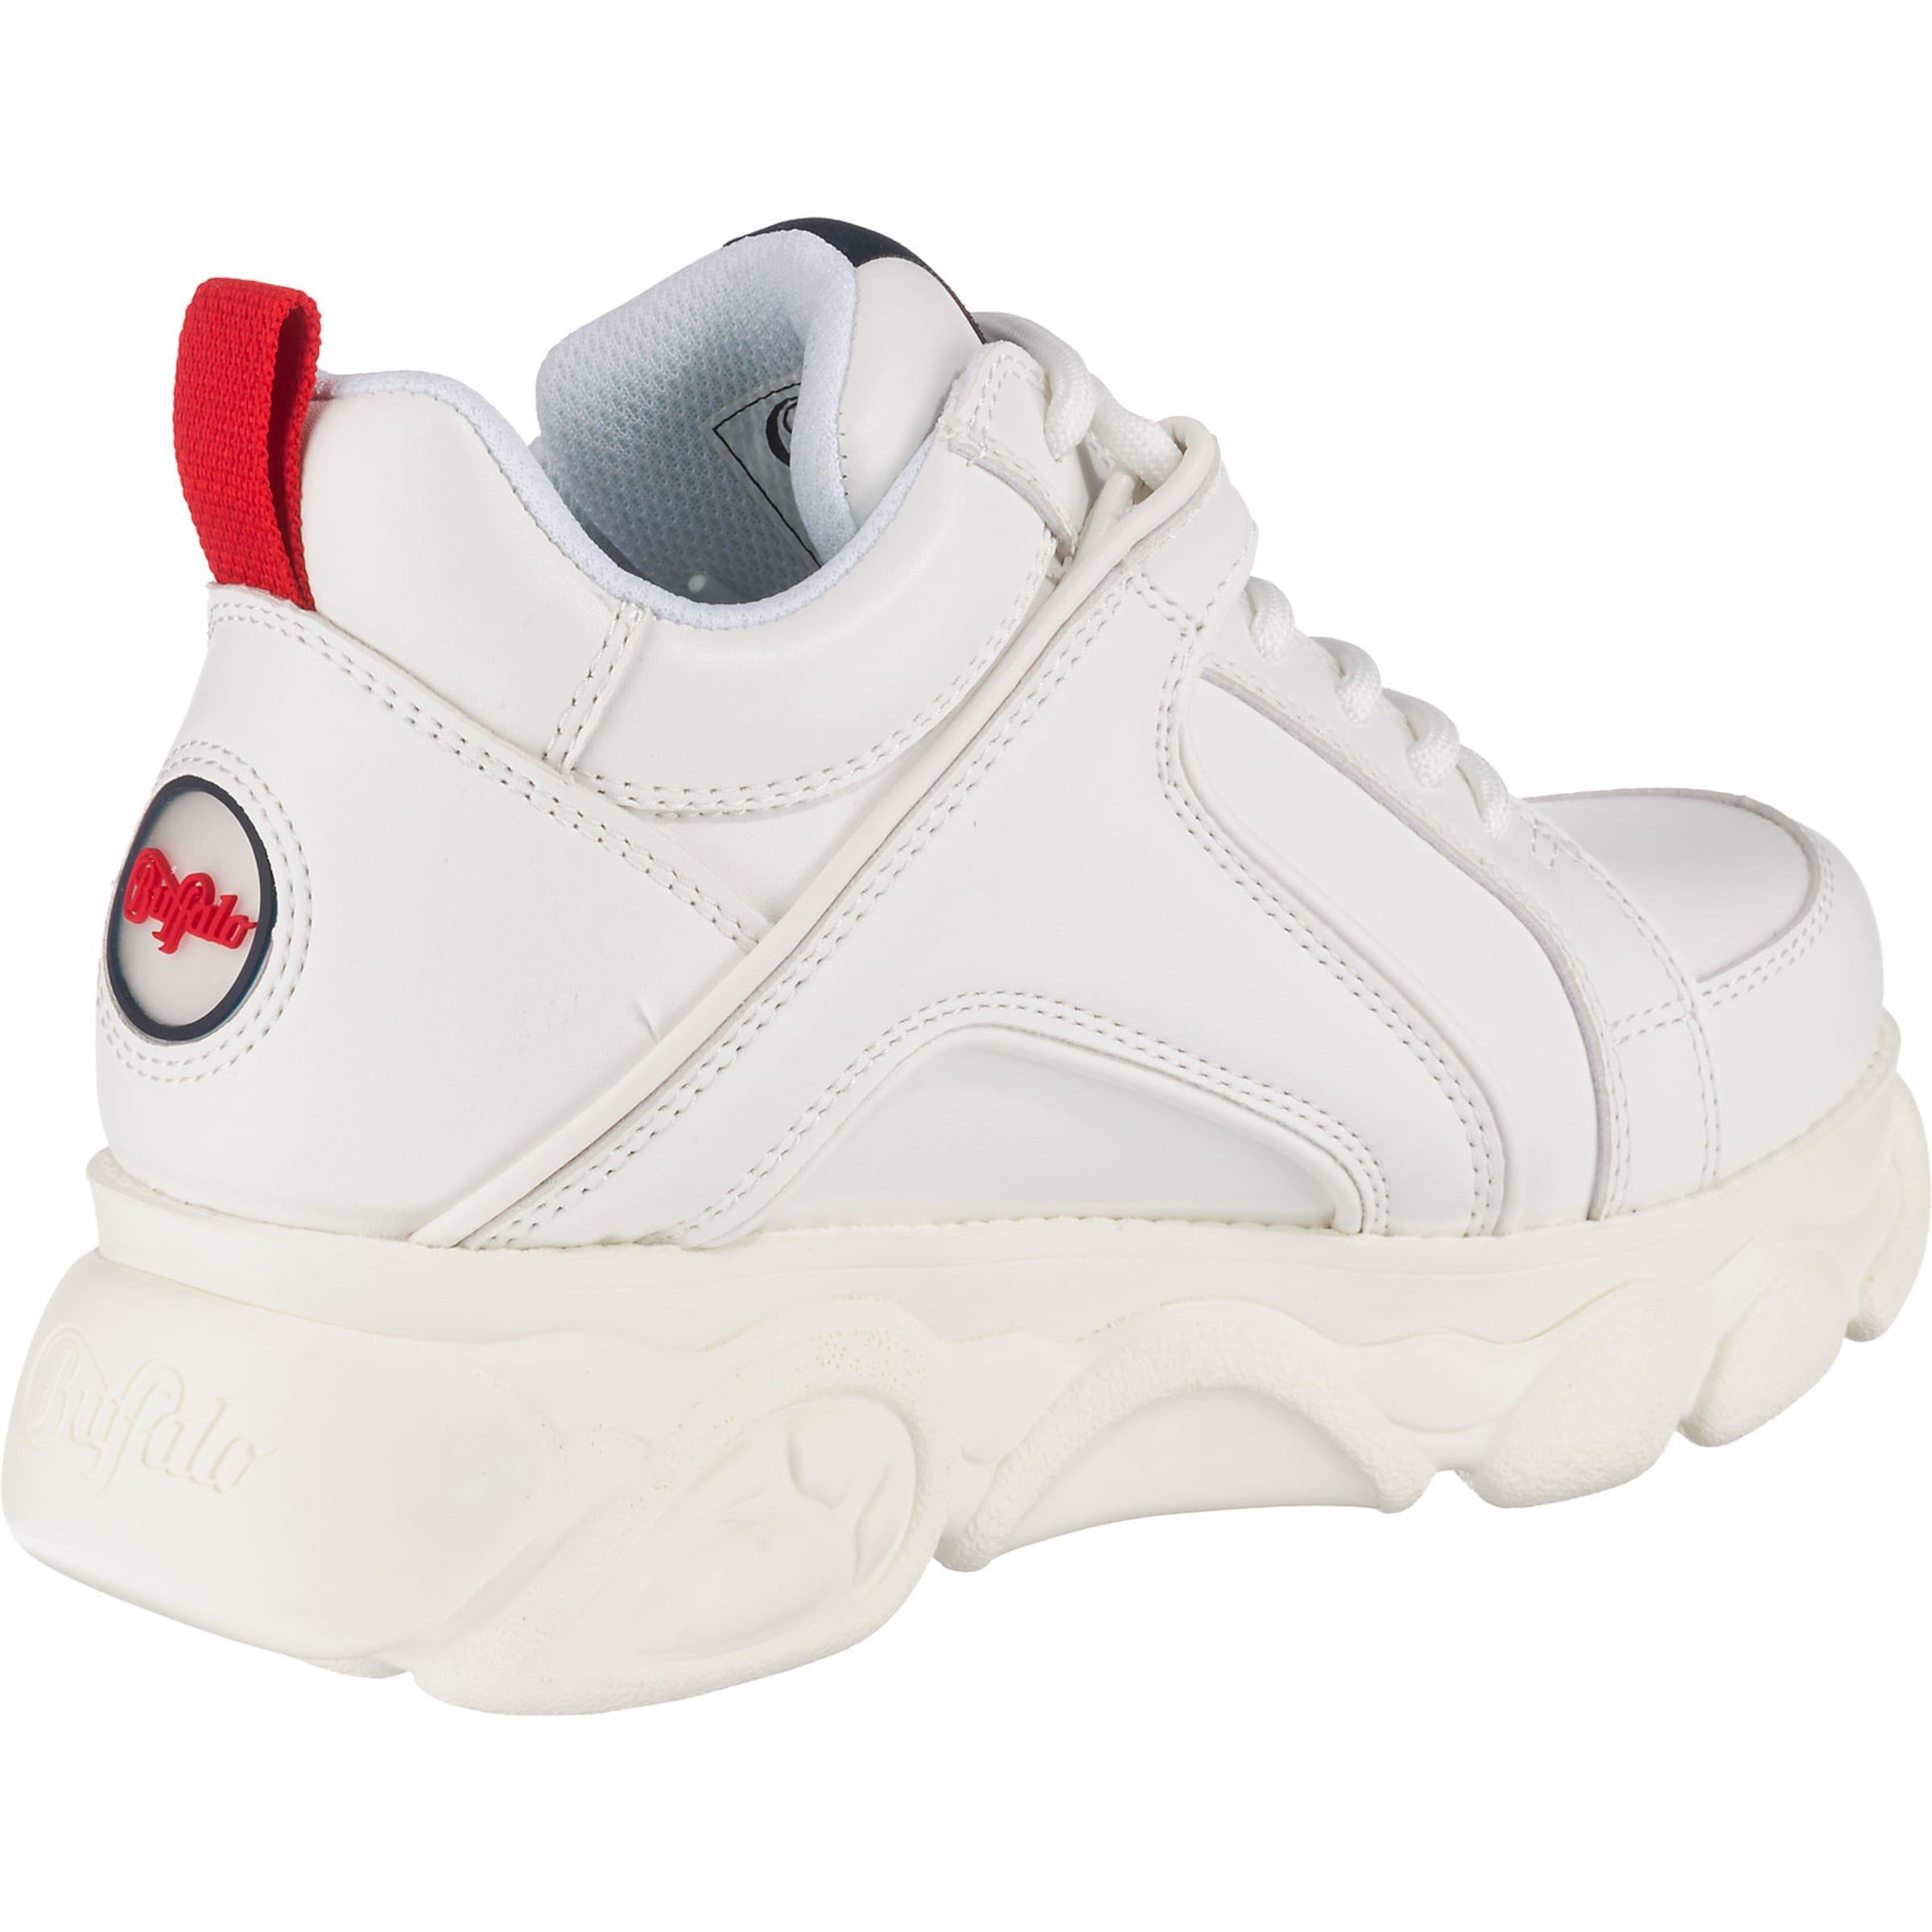 Buffalo 'corin' 'corin' Buffalo Sneaker 'corin' Buffalo Weiß Sneaker Weiß In In Sneaker E2IDHW9